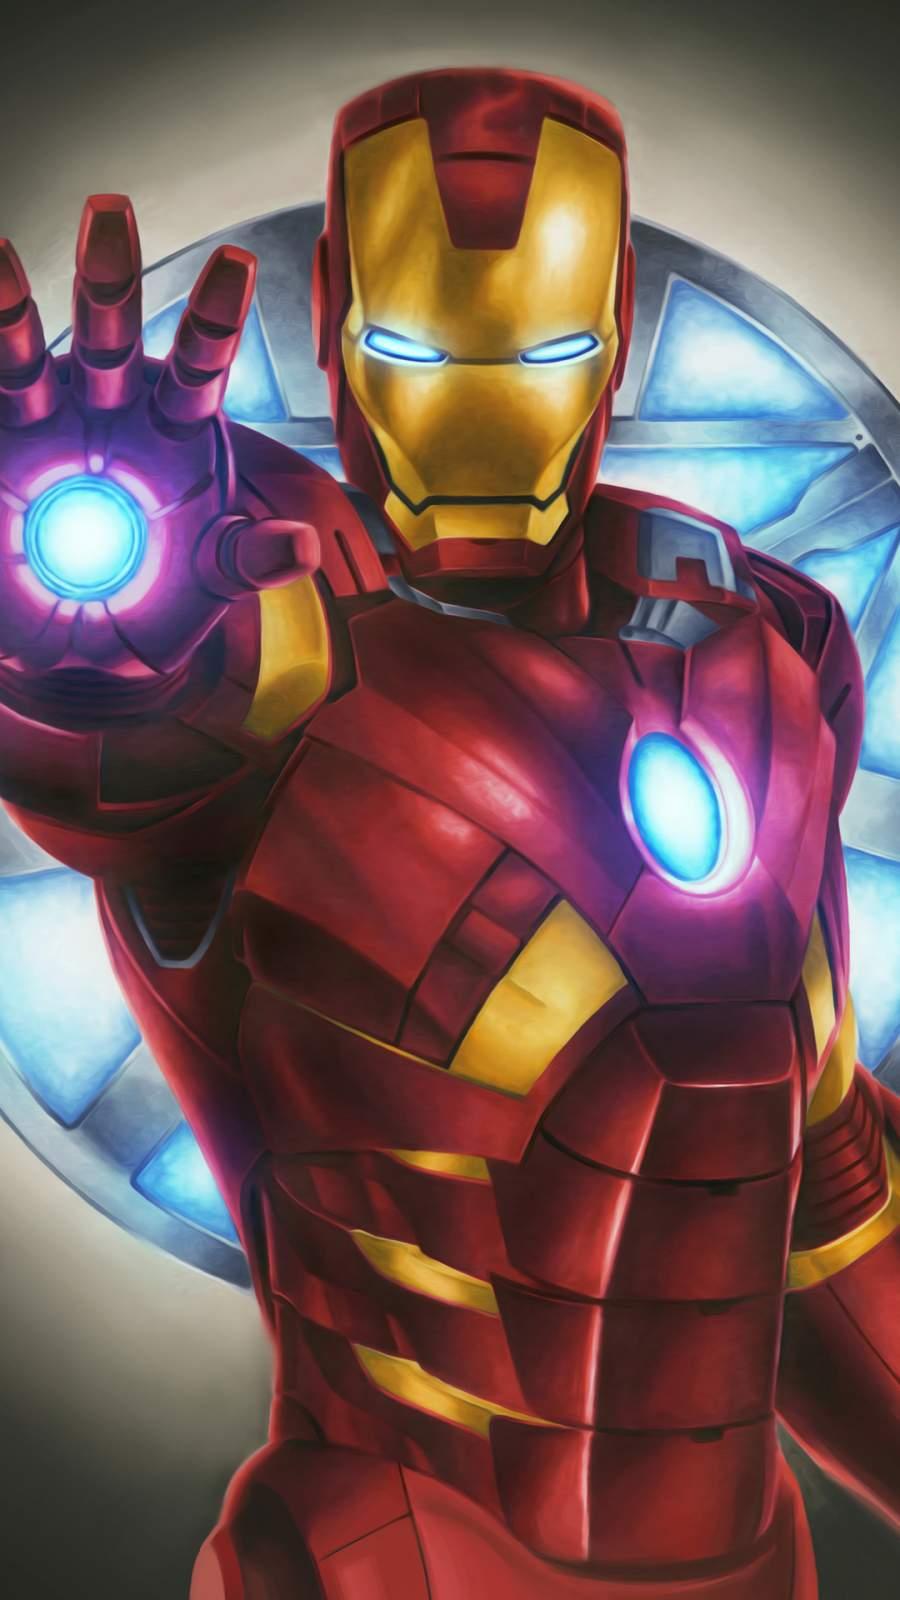 Iron Man Digital Art iPhone Wallpaper